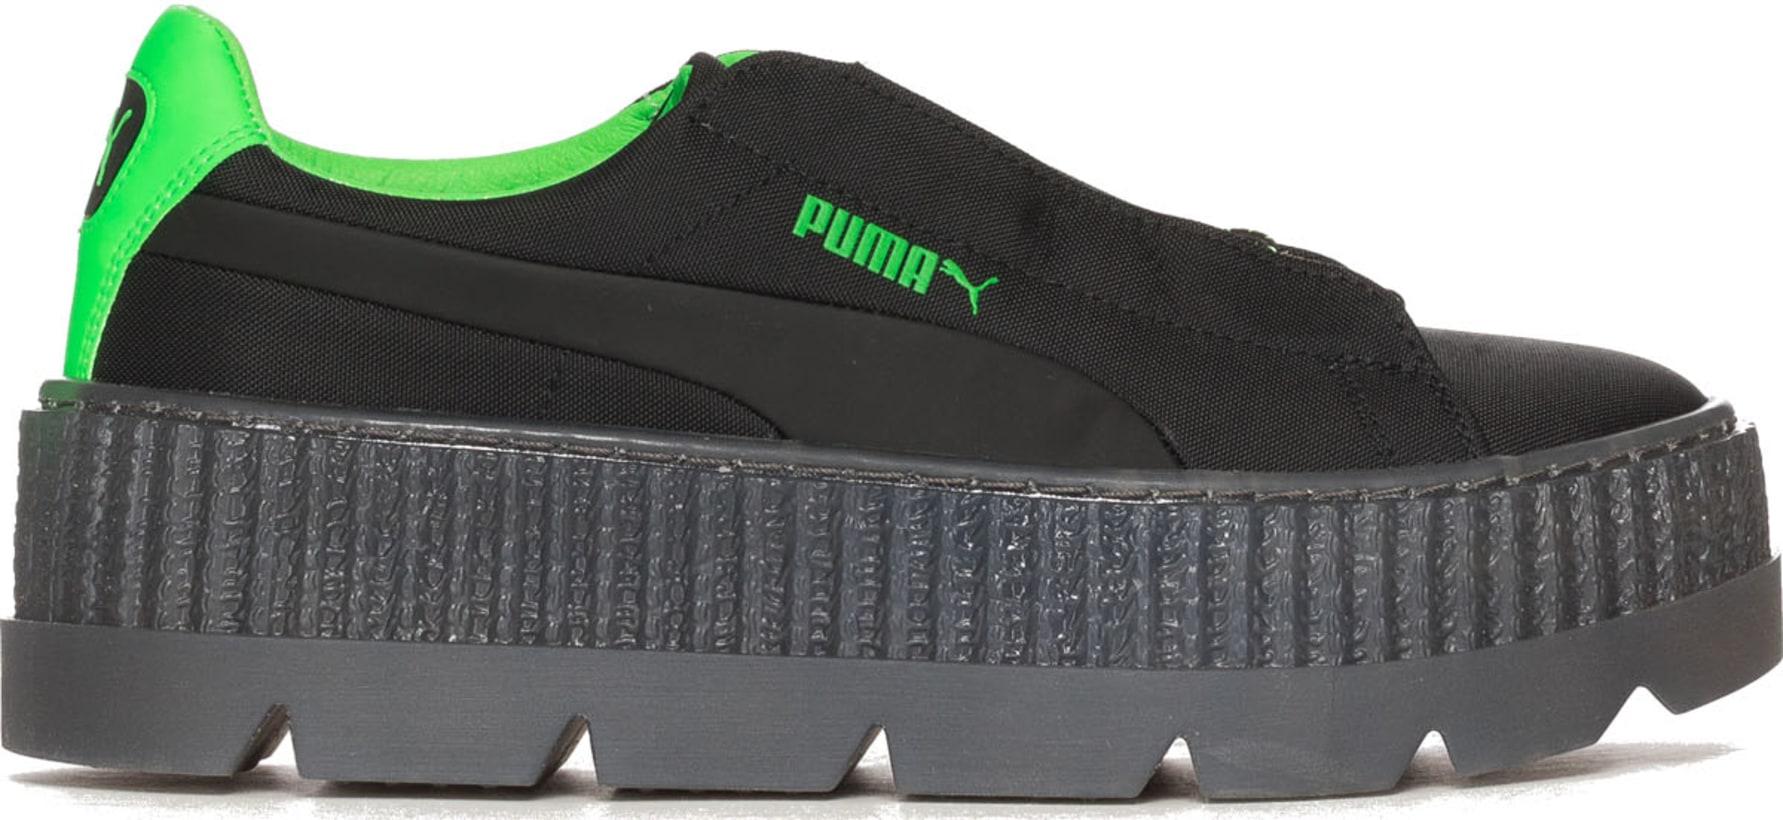 wholesale dealer 26427 9e89c Puma - Fenty Cleated Creeper Surf - Black/Green Gecko